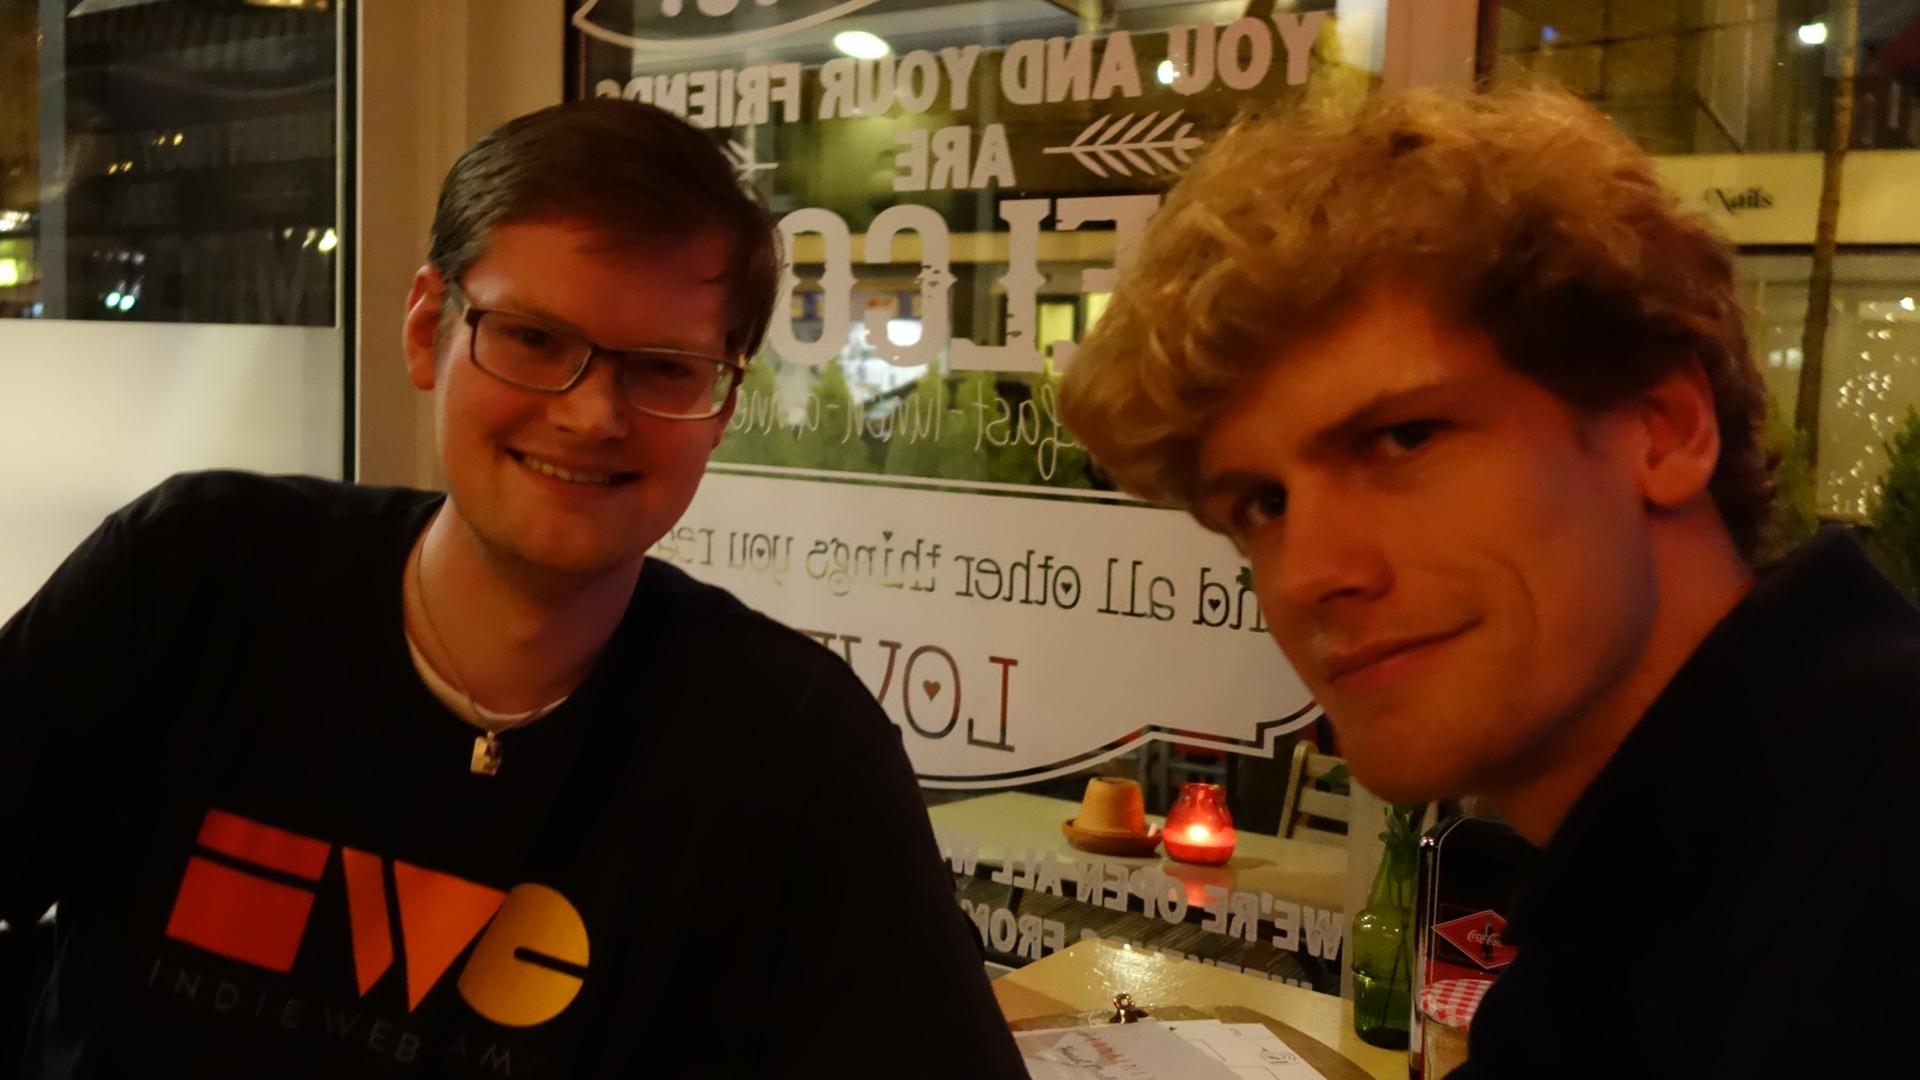 IndieWebCamp Netherlands participants